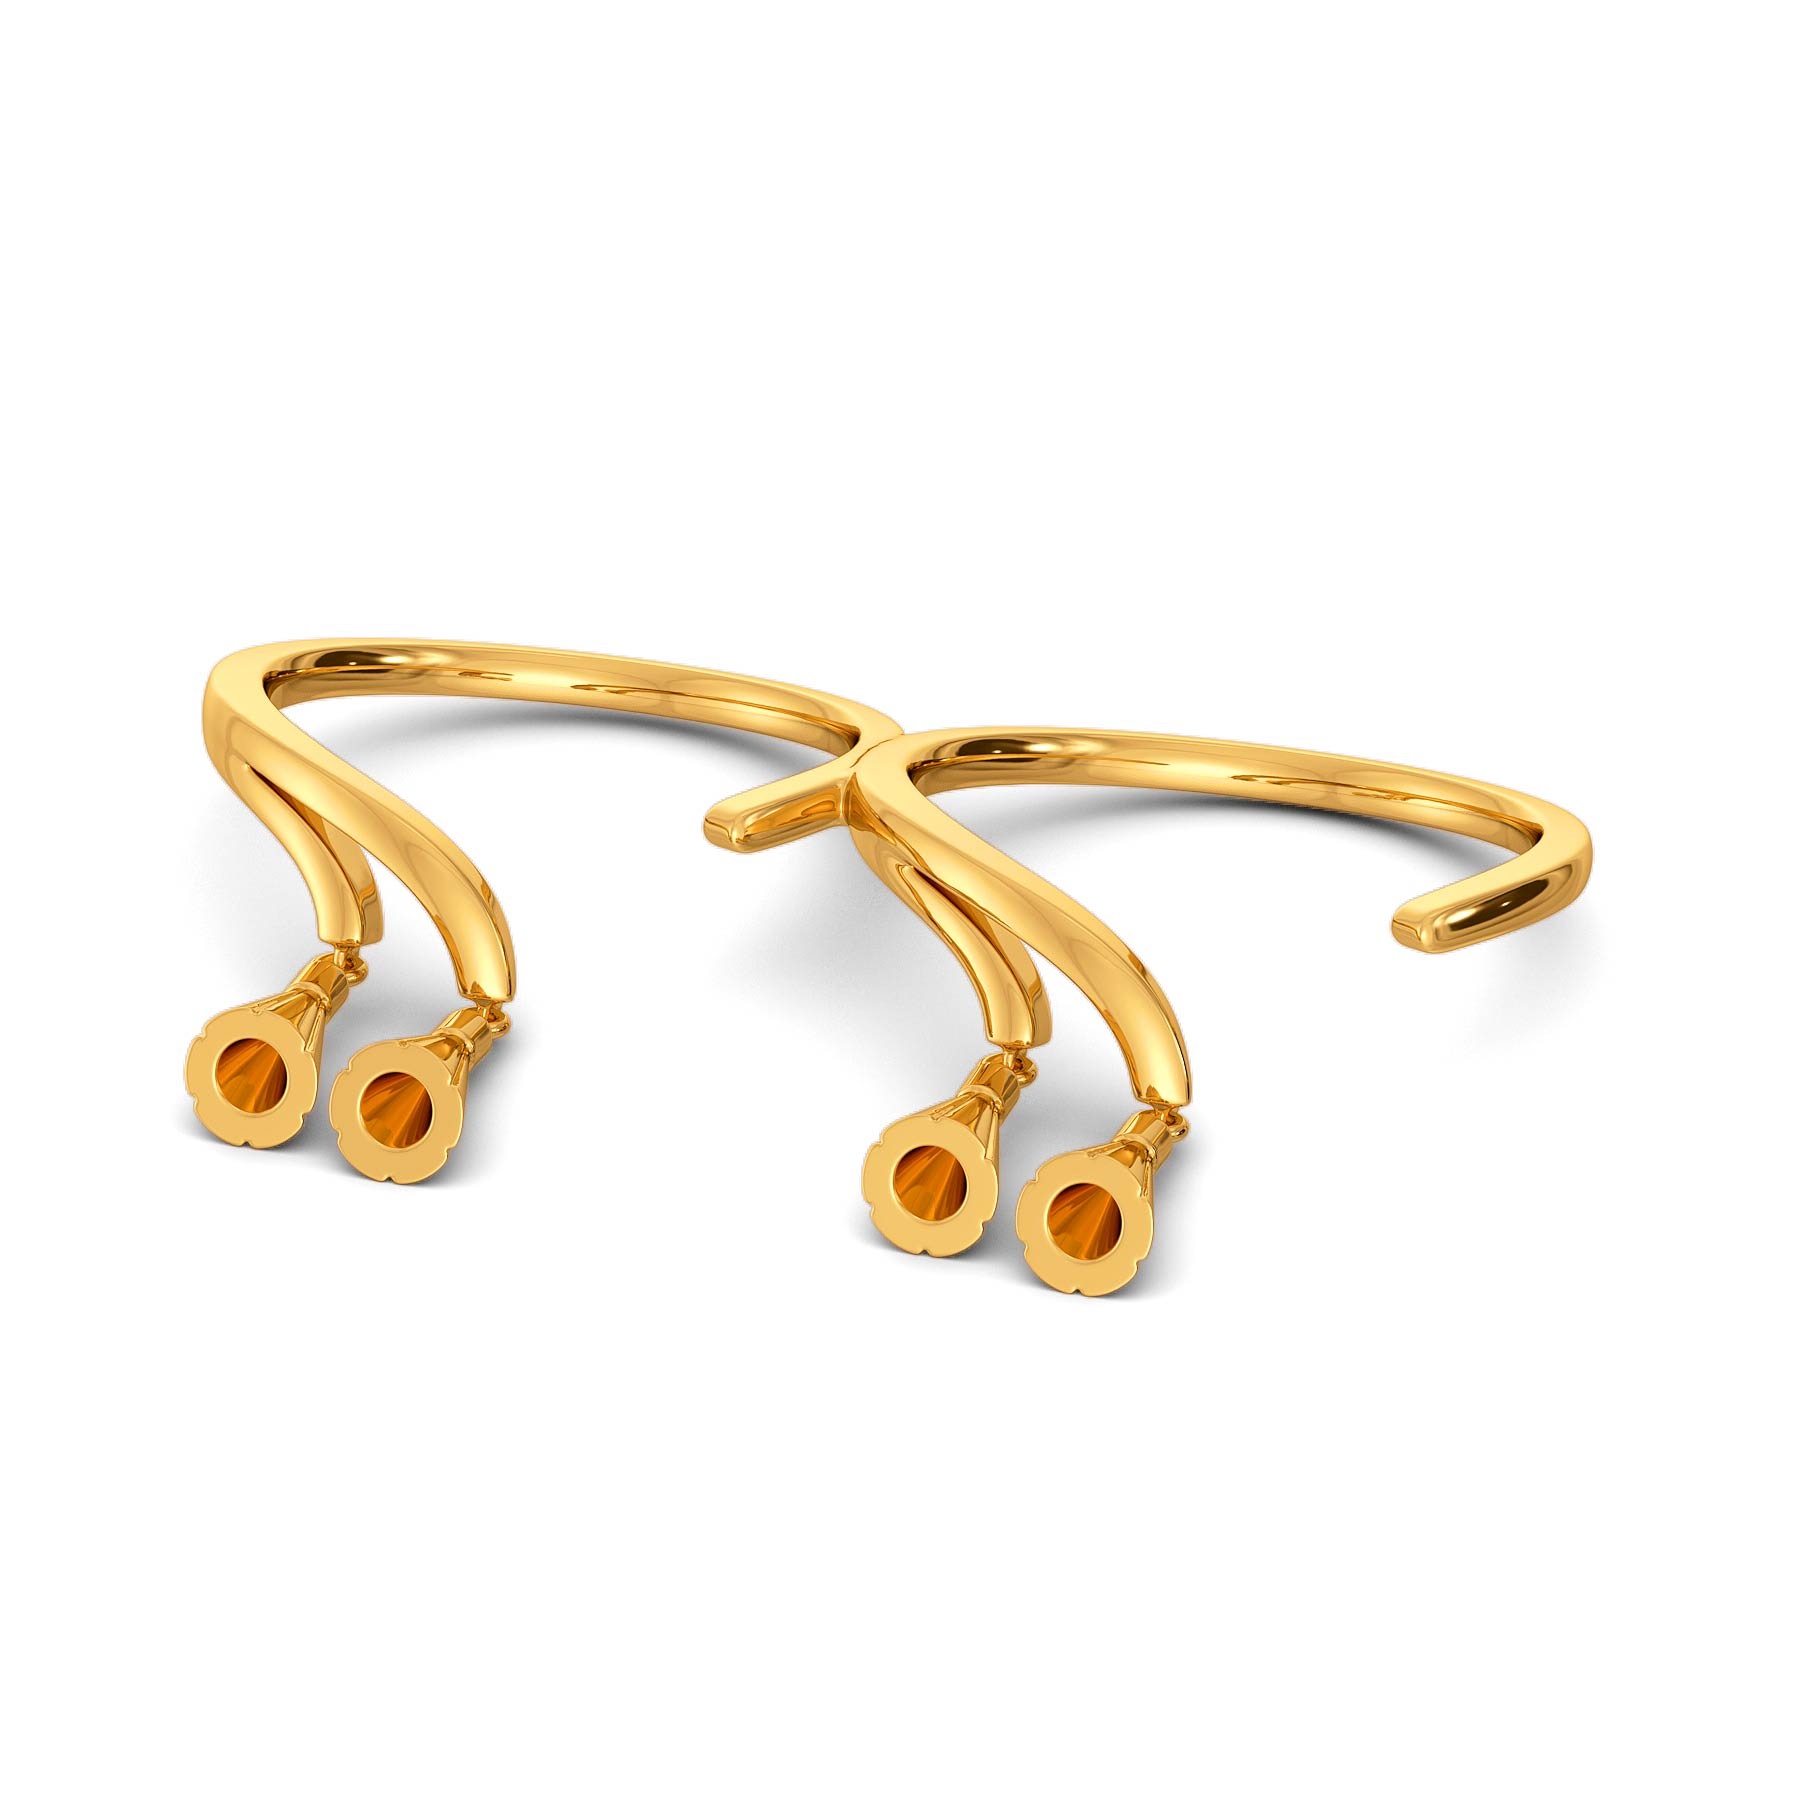 Tassel Tails Gold Rings